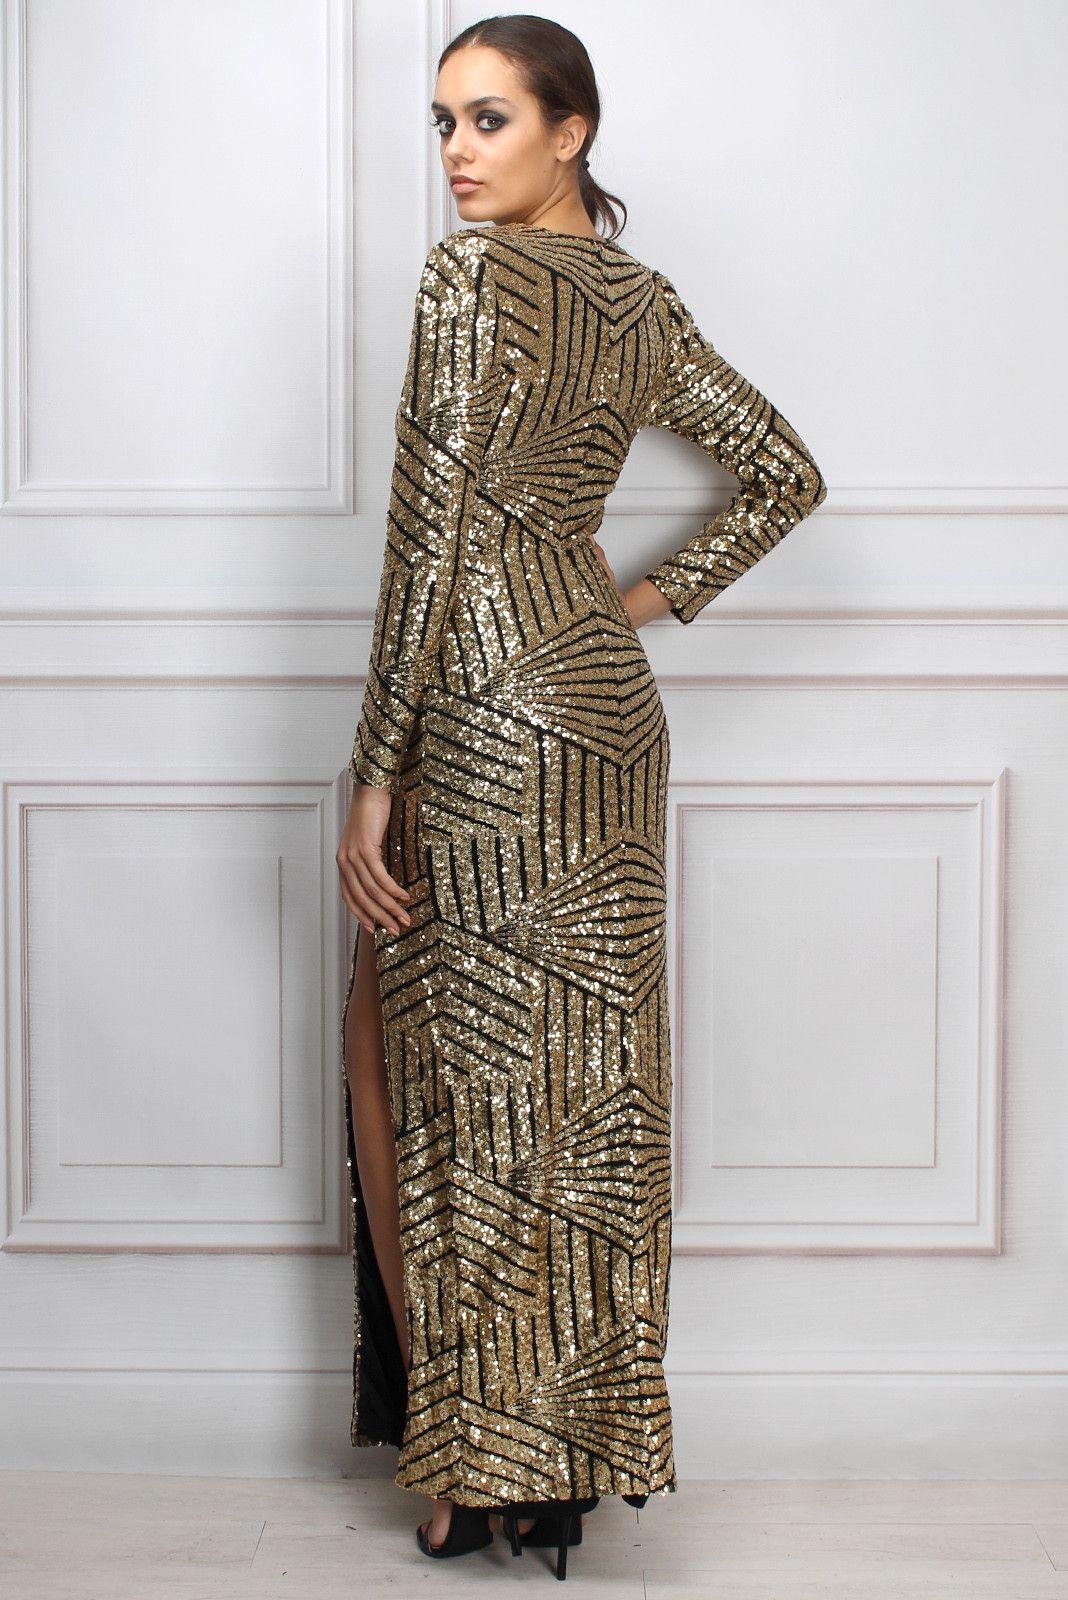 Sam Faiers Wears Gold Long Sleeve Sequin Maxi Dress | Rare London ...